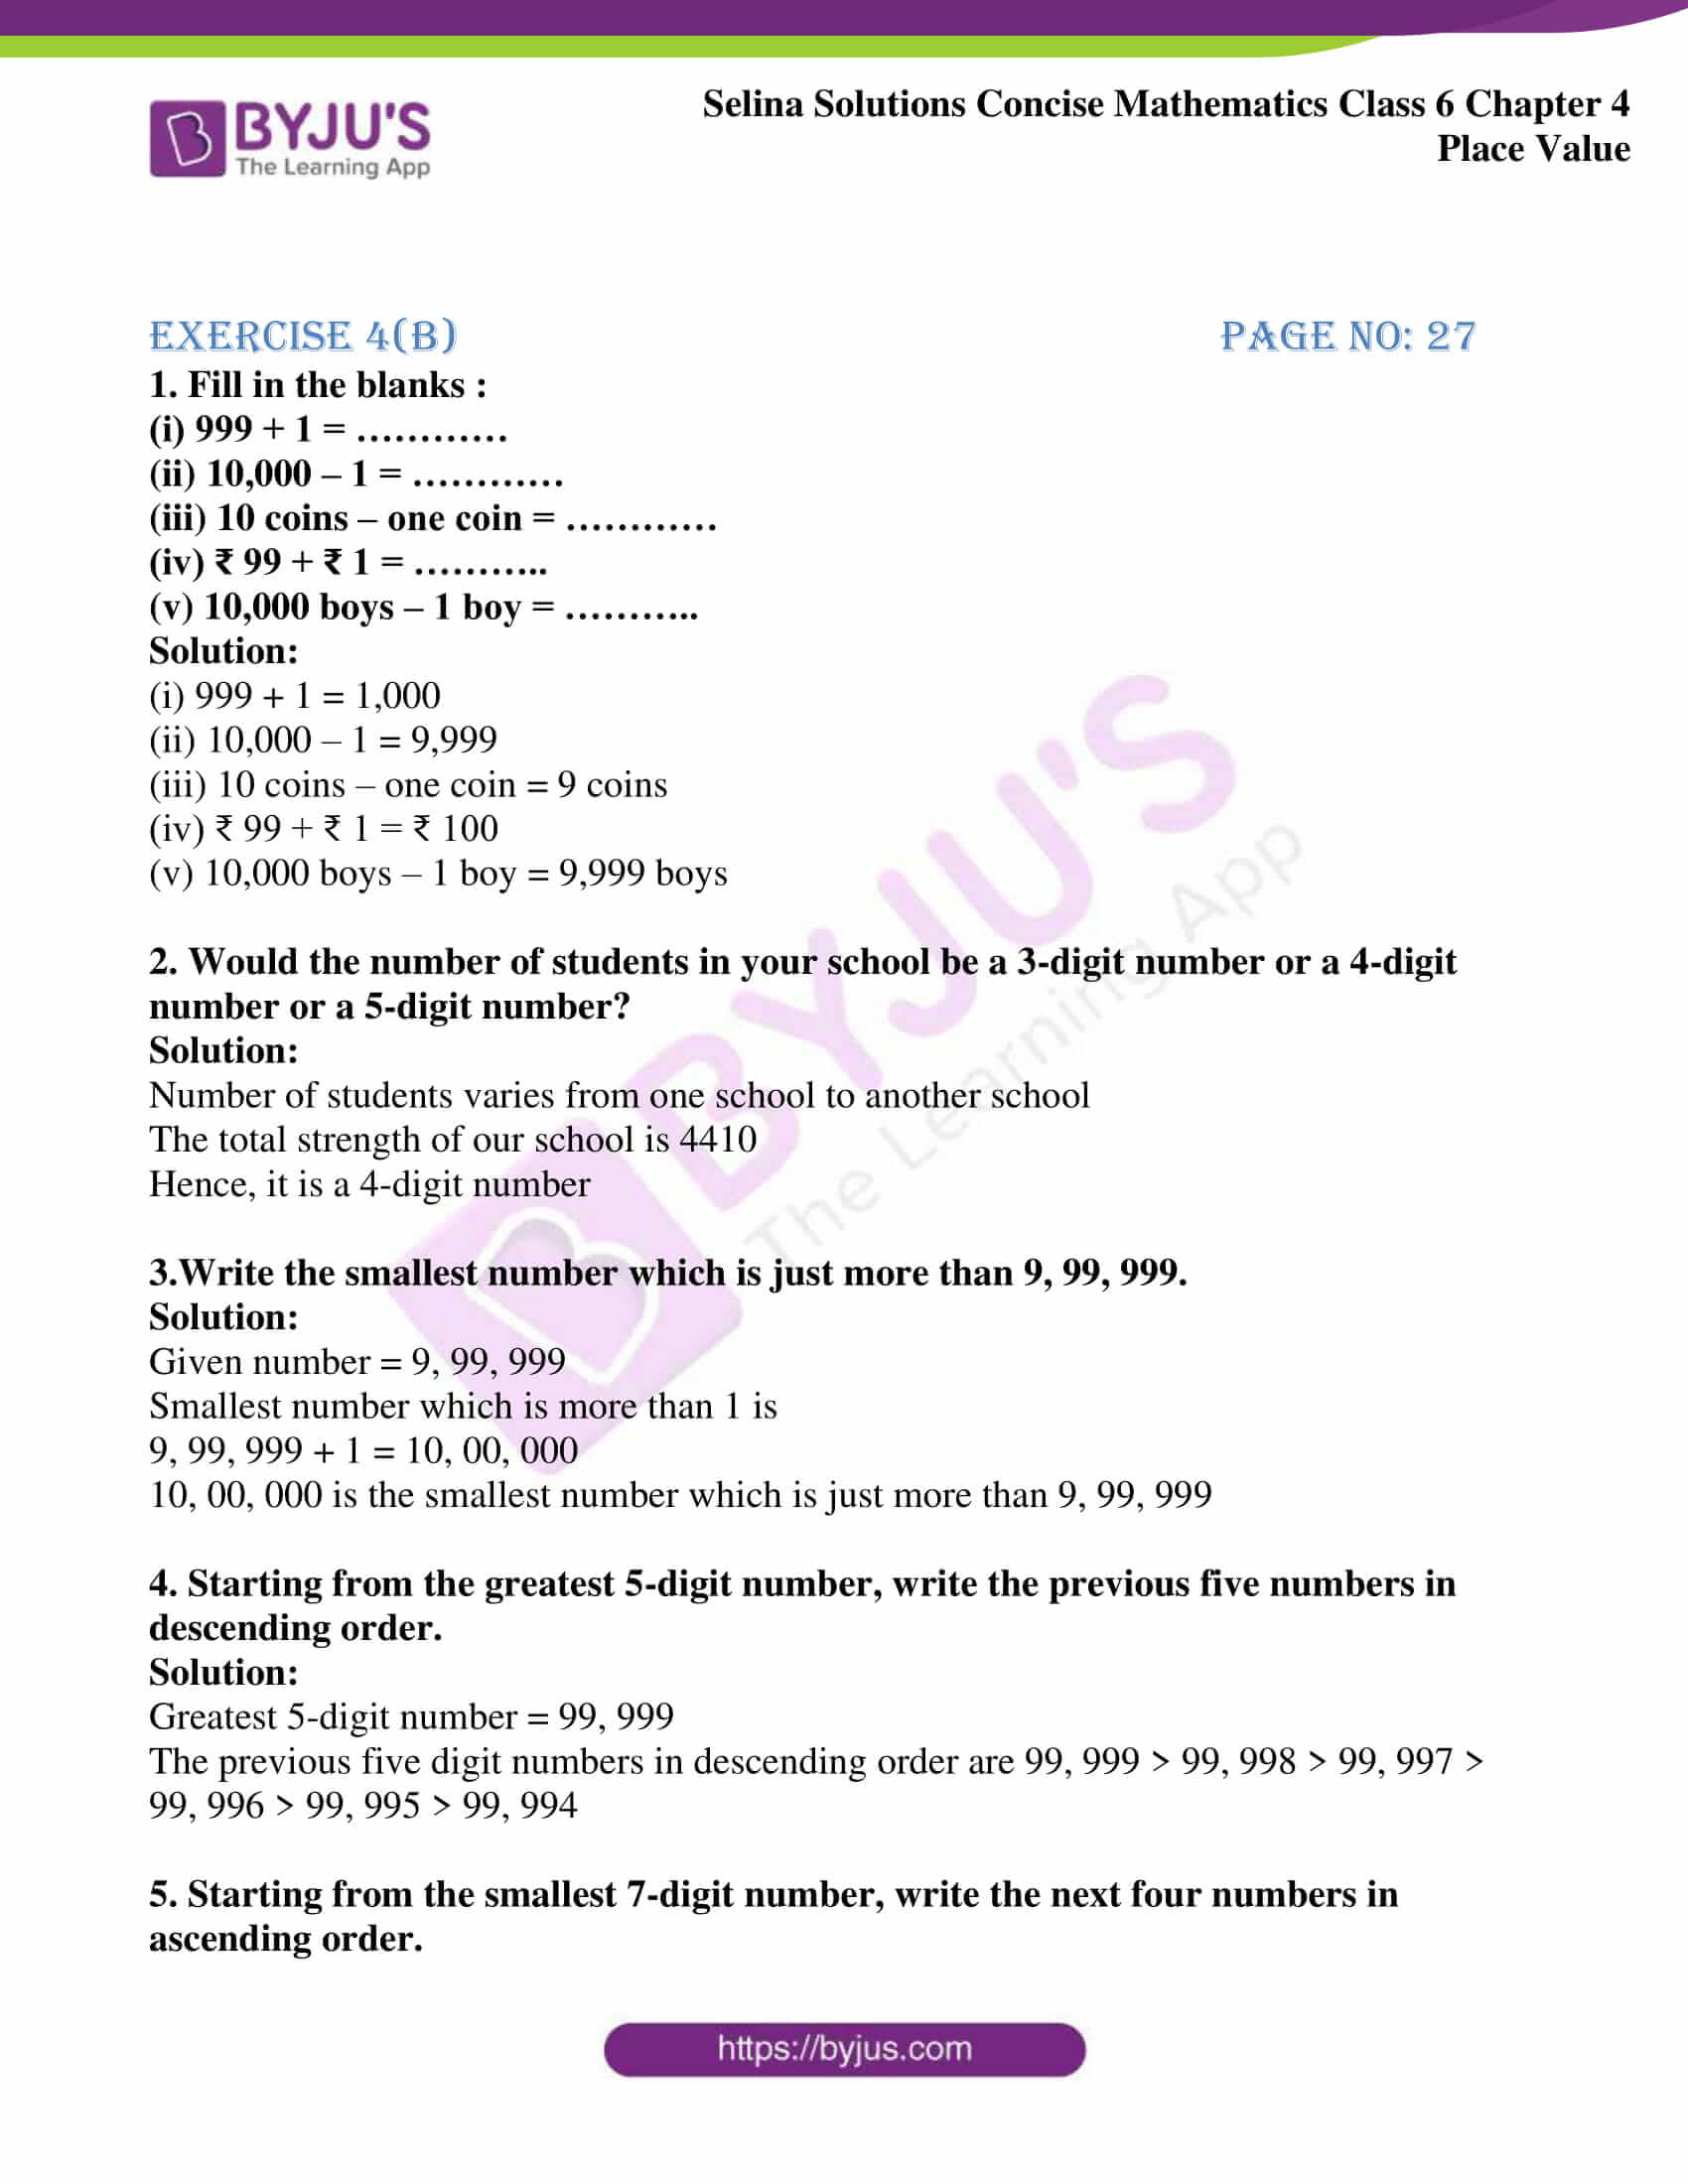 selina sol concise maths class 6 ch4 ex 4b 1